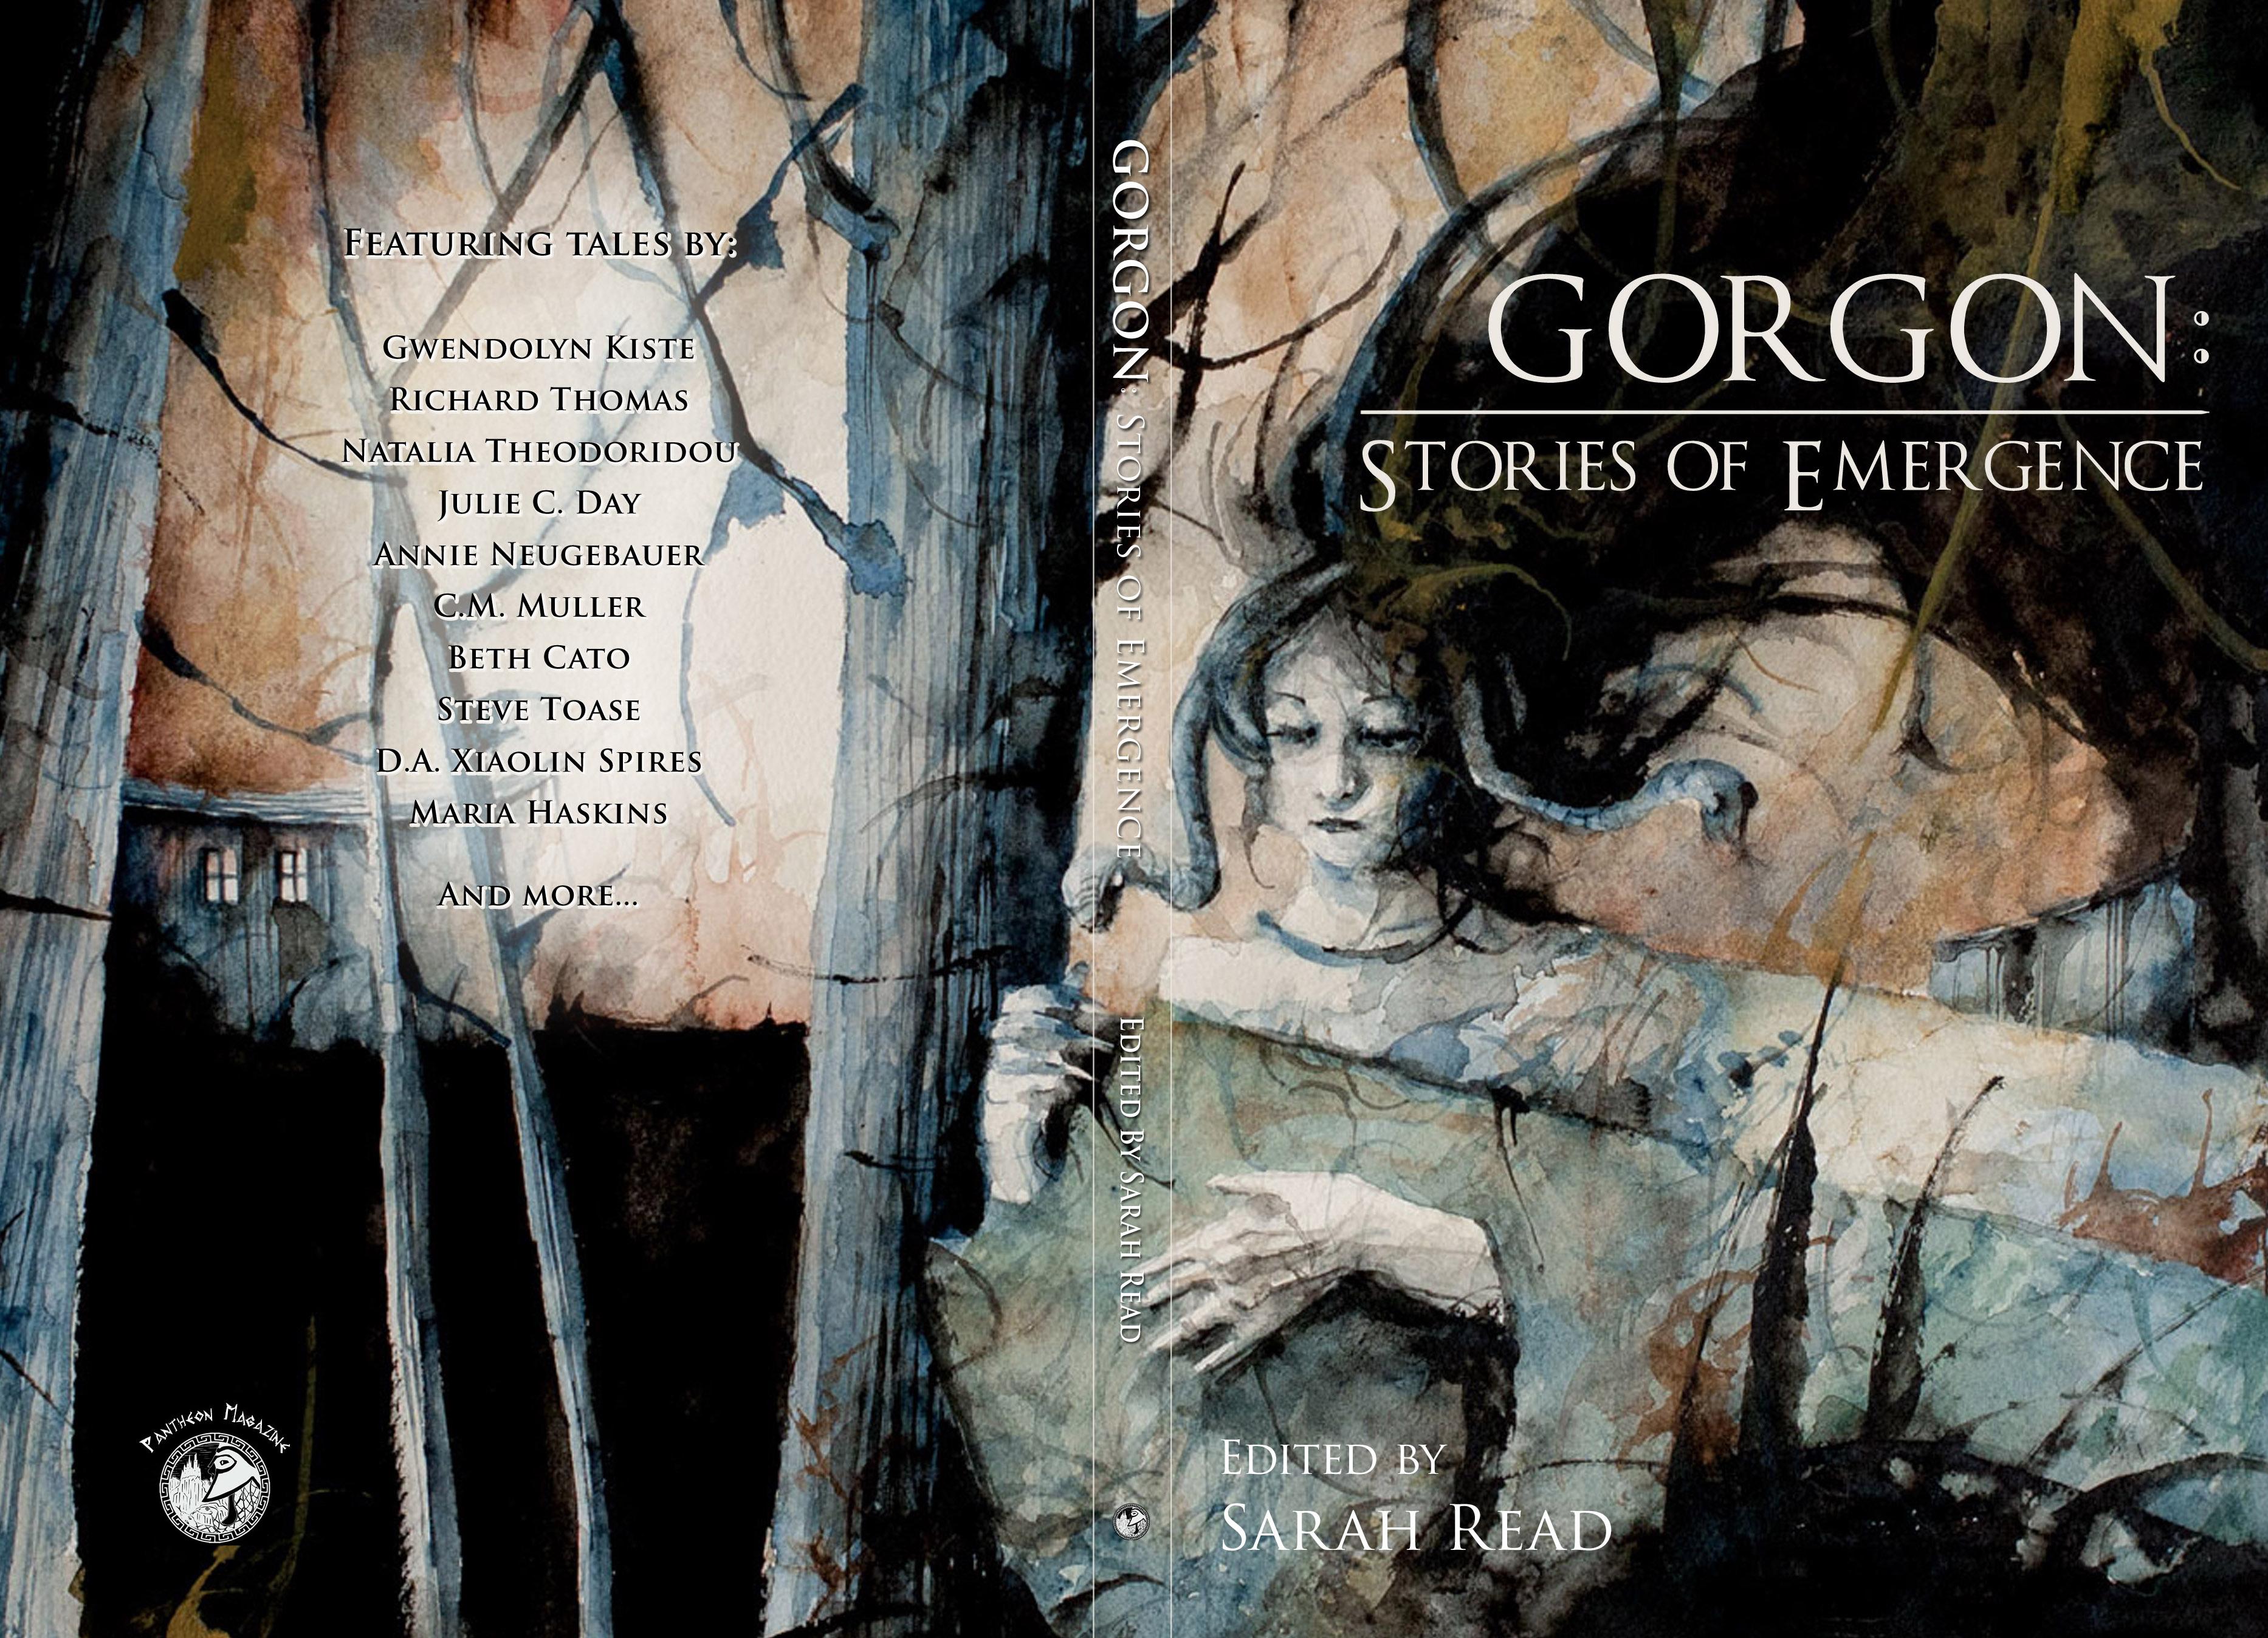 Gorgon Cover V2 (1)